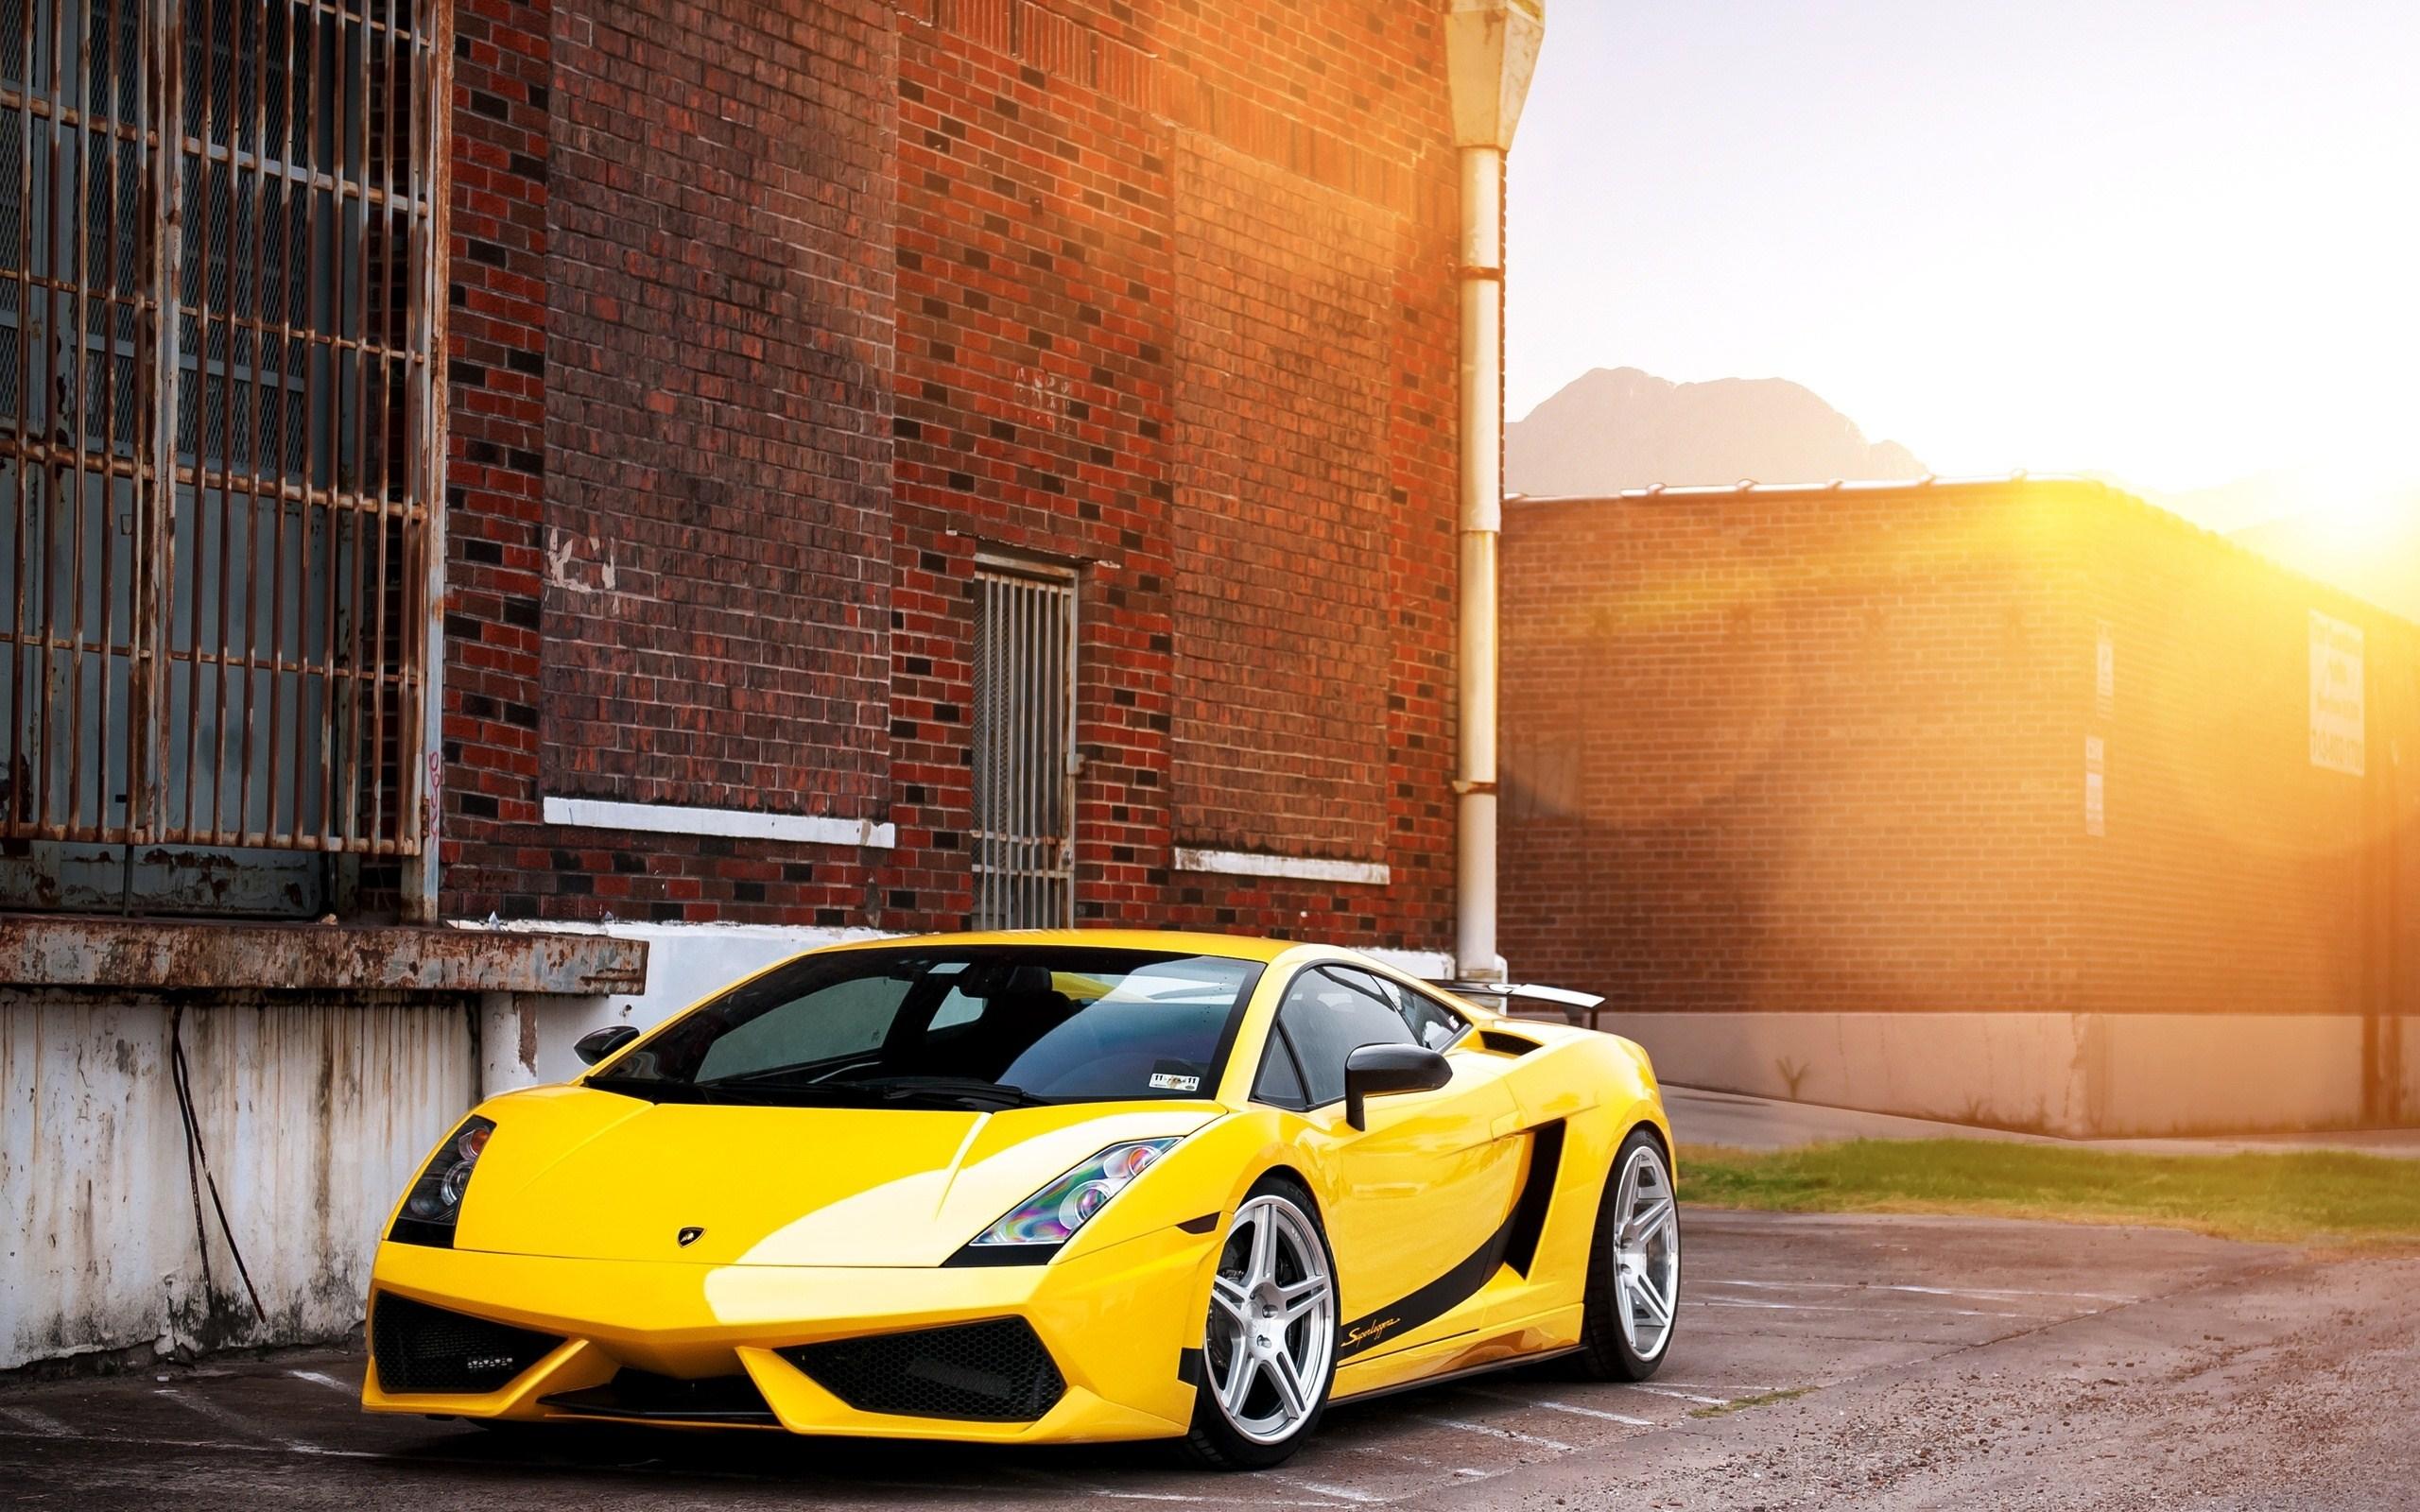 Free Yellow Lamborghini Wallpaper